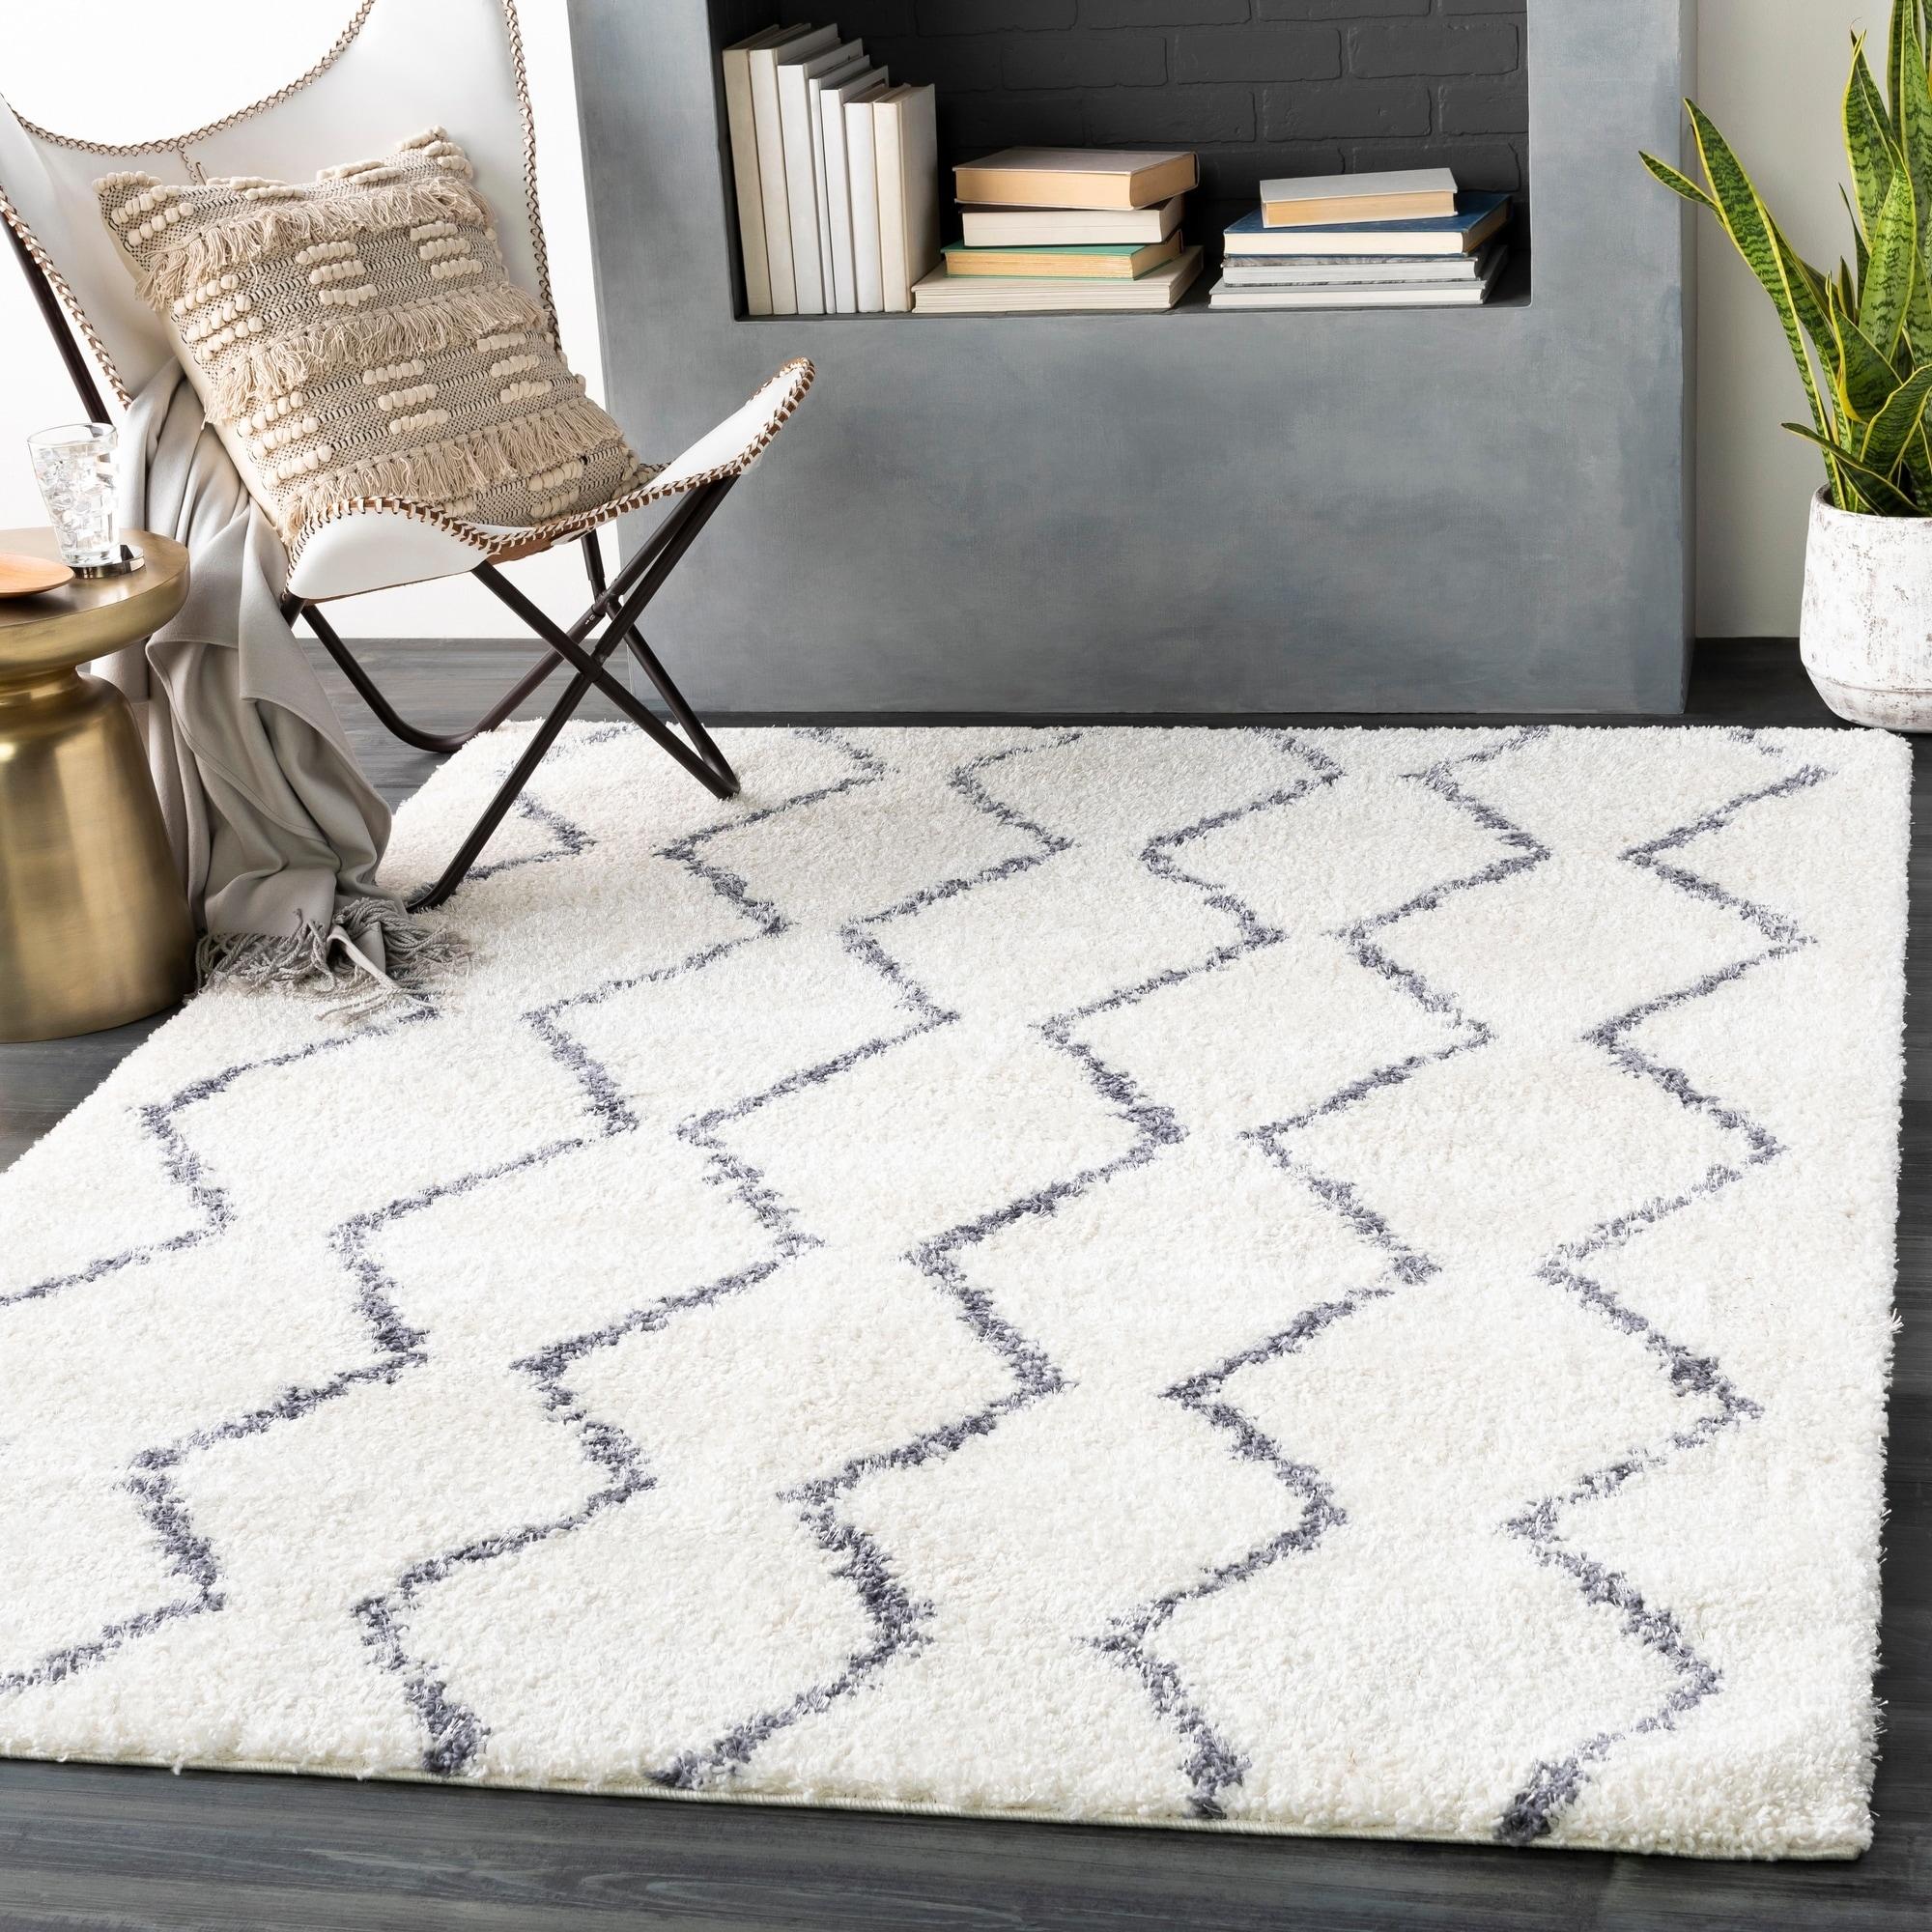 Hakima Moroccan Trellis Shag Area Rug White 2 X 3 Gray Rugs Area Rugs Beige Carpet